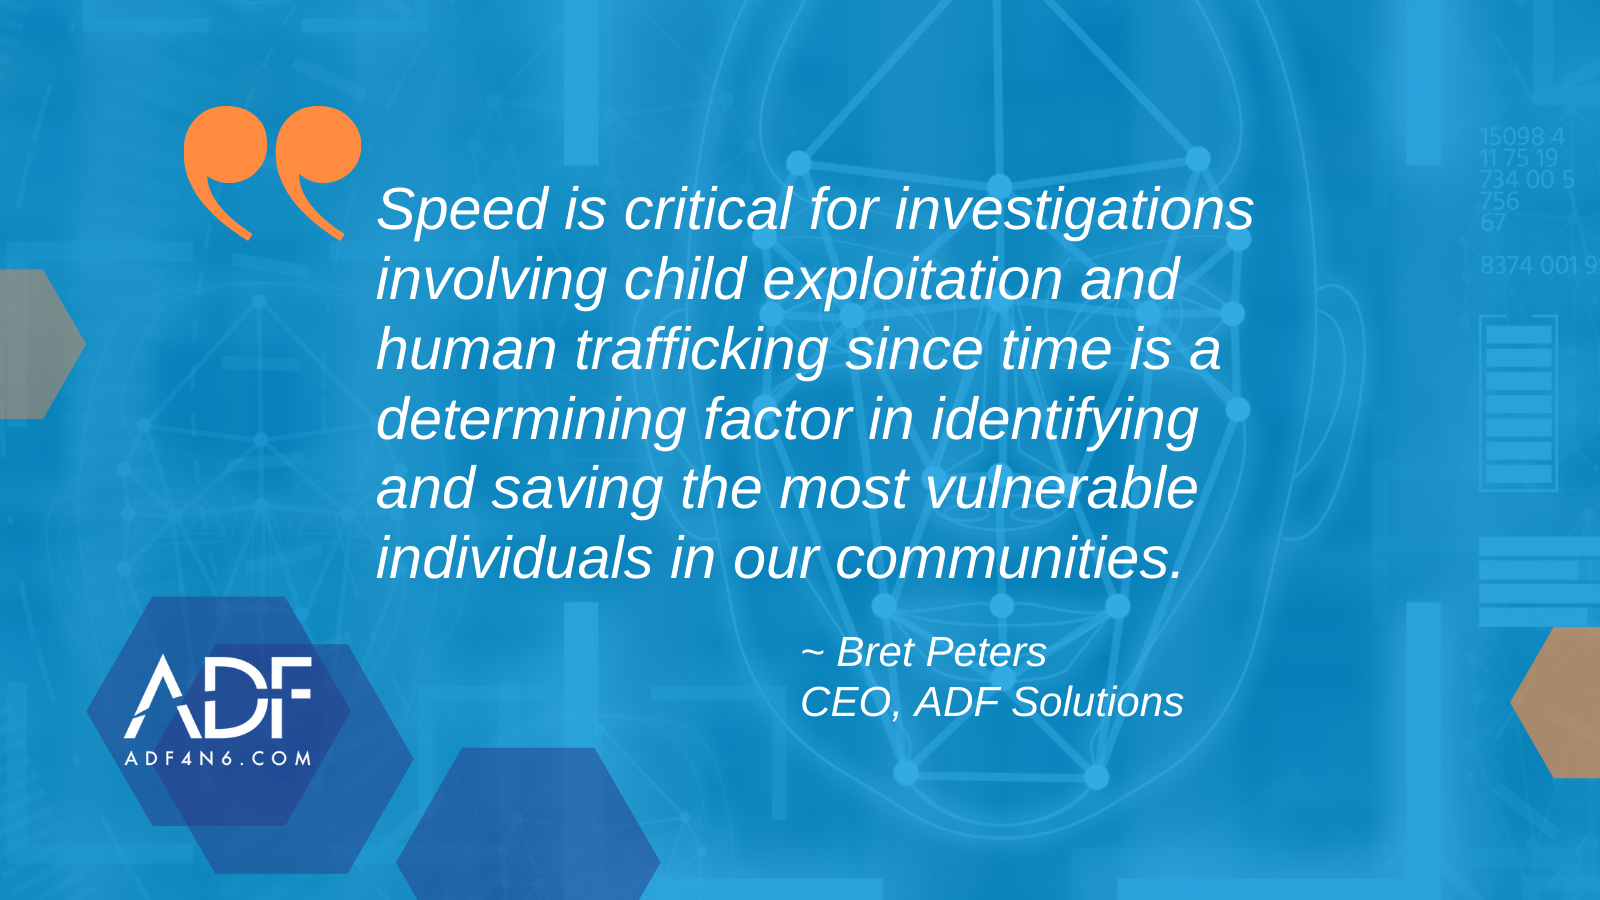 Facial Analytics Capabilities Speed Child Exploitation Investigations